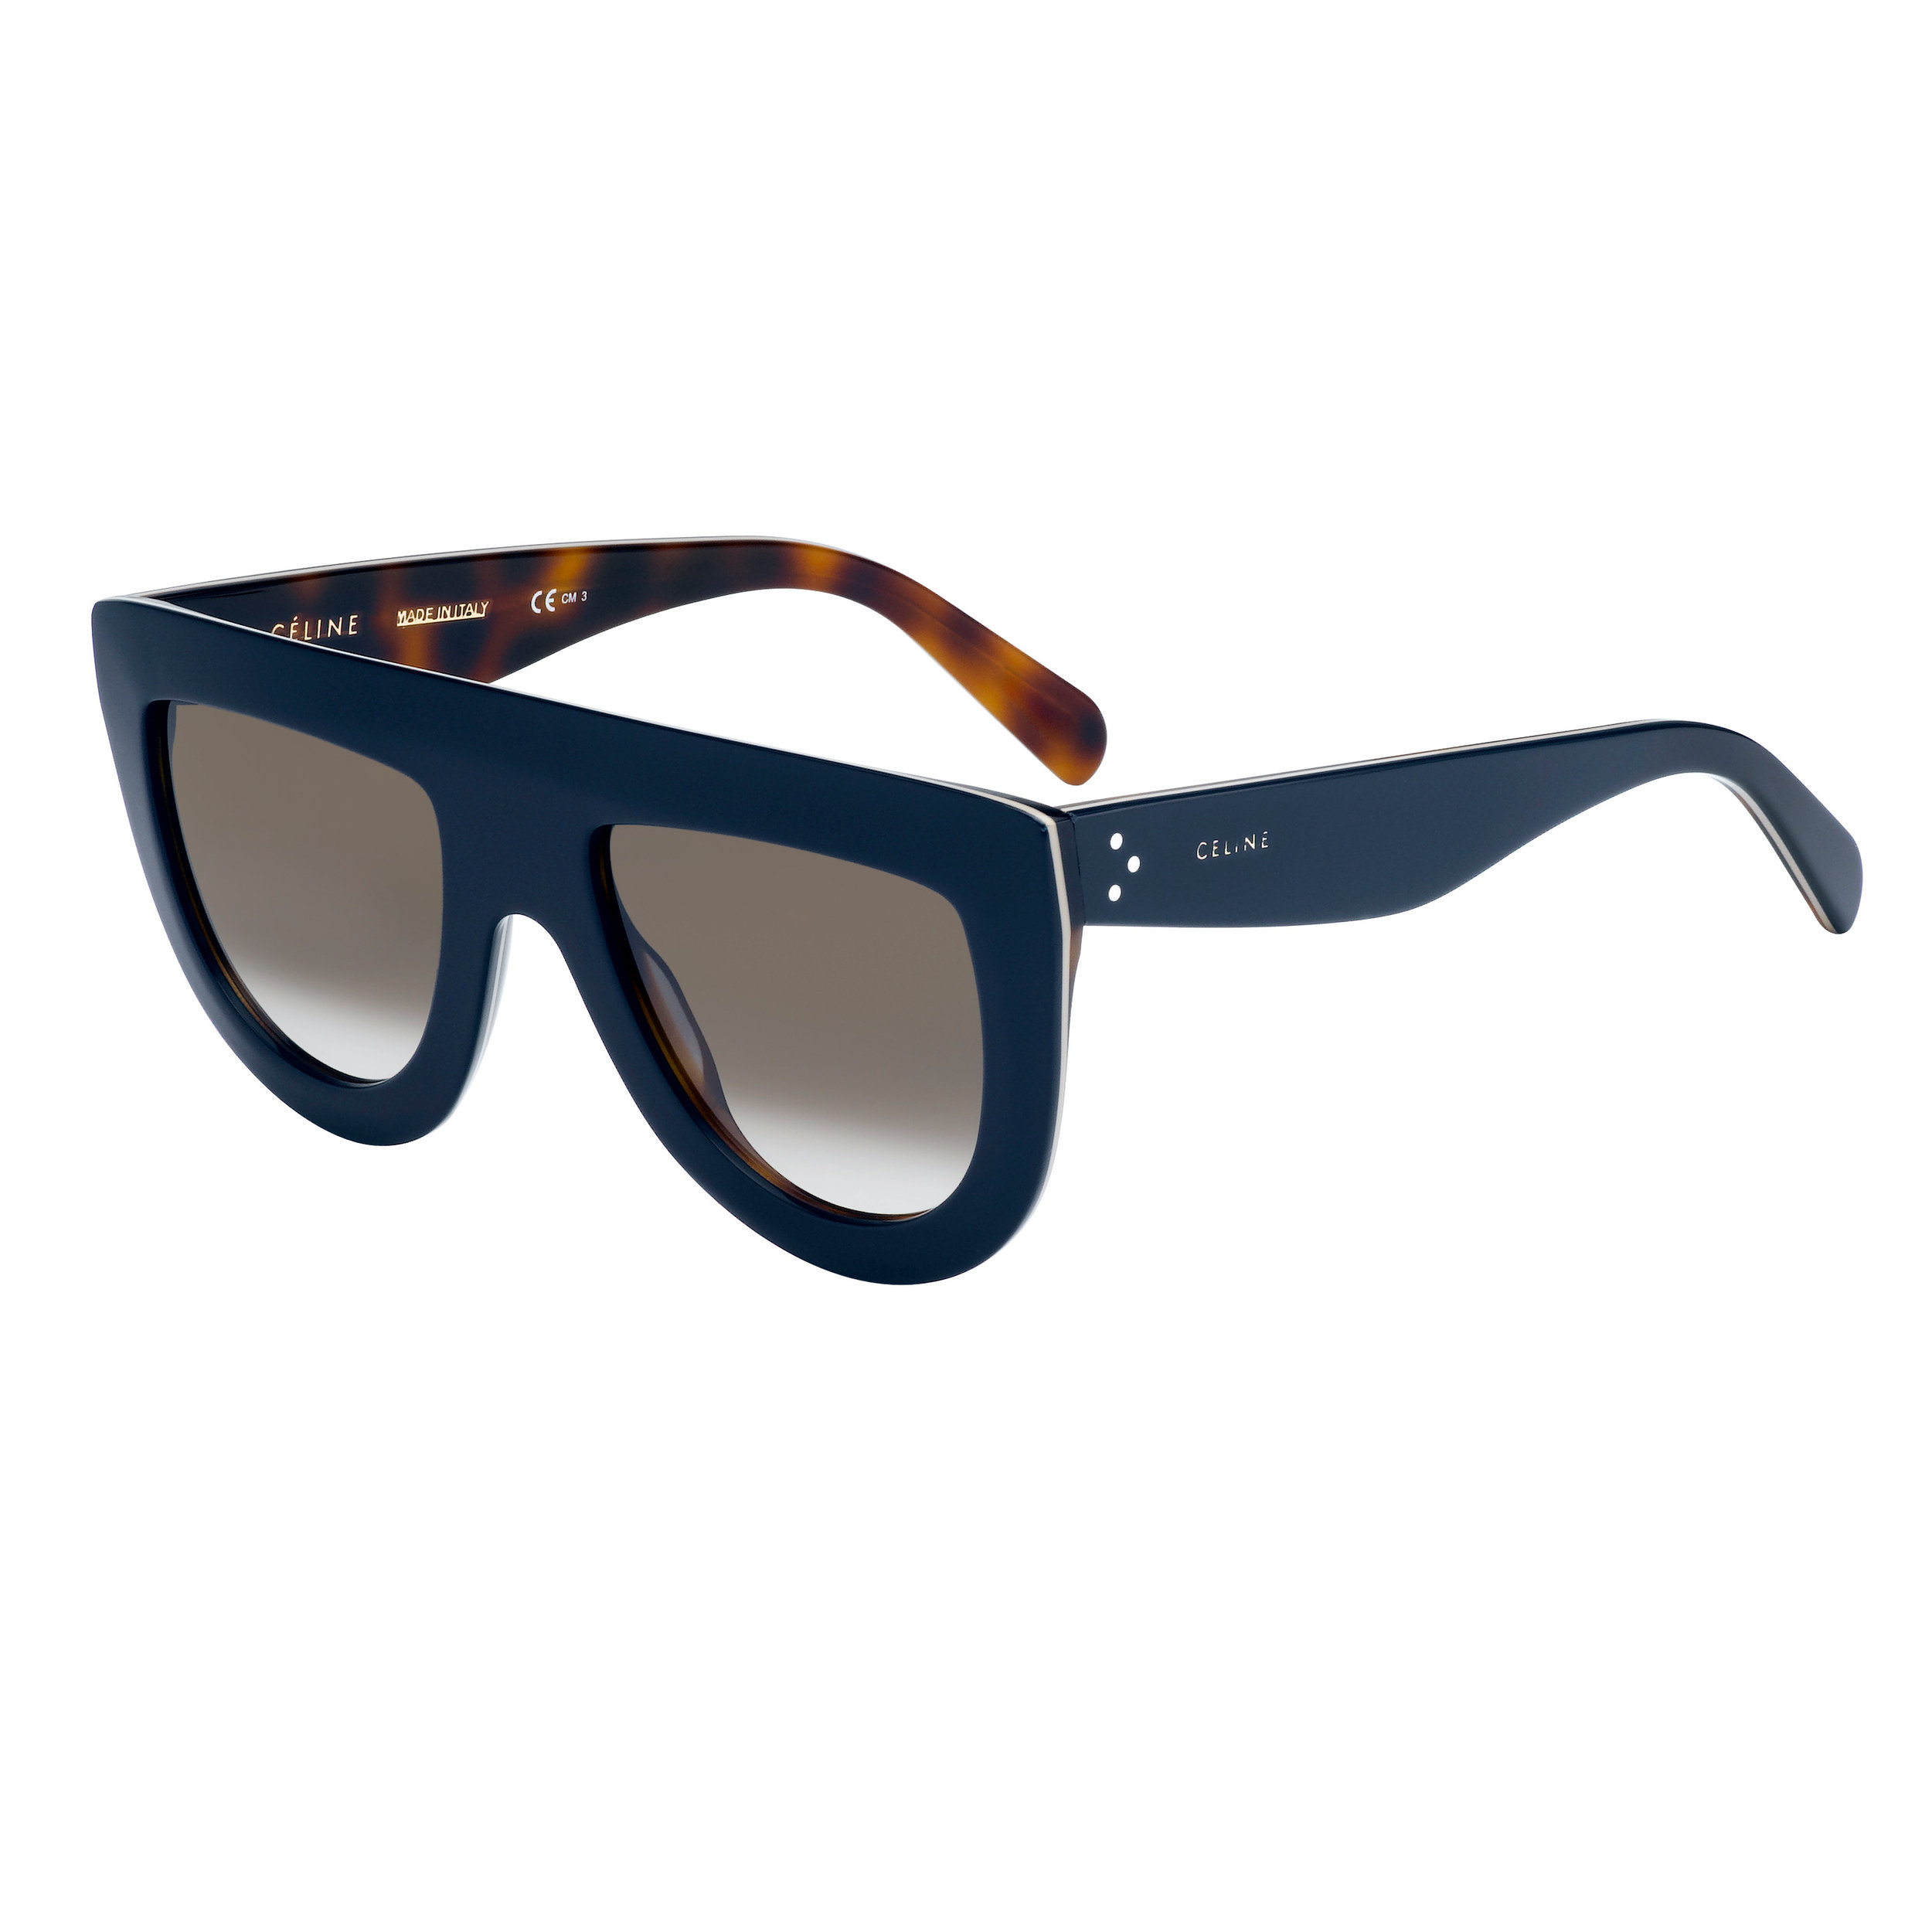 027f82613d6 Celine Andrea Oversized Flat Top Sunglasses in Navy. cl41398s 273z3 (1).jpg